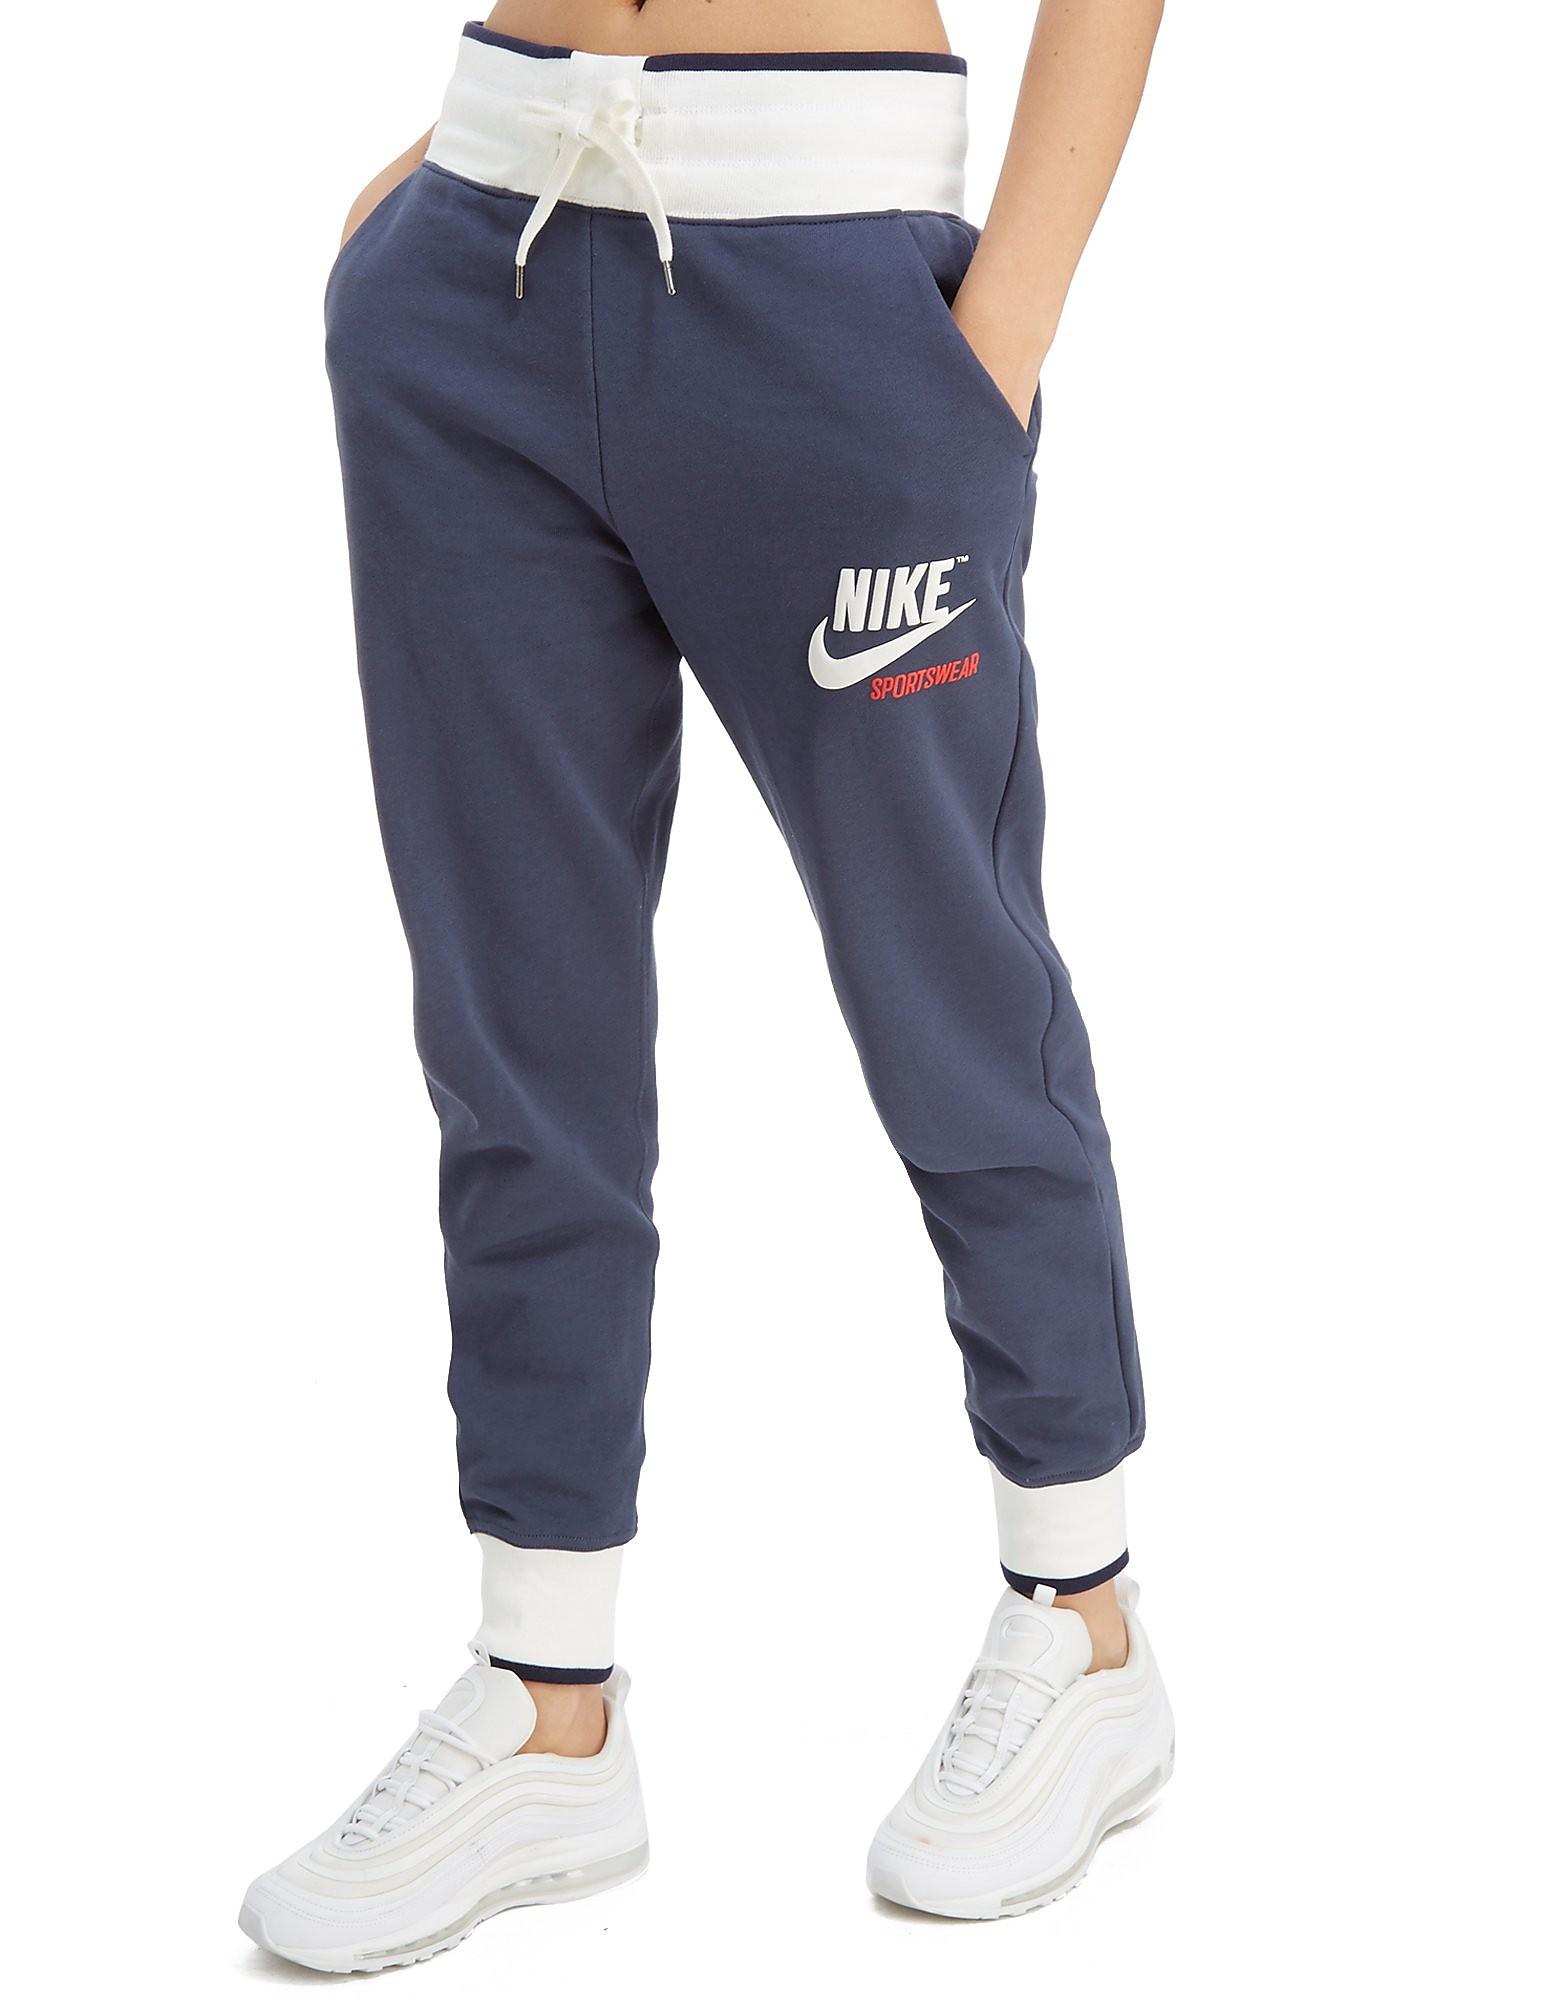 Nike pantalón Archive Fleece